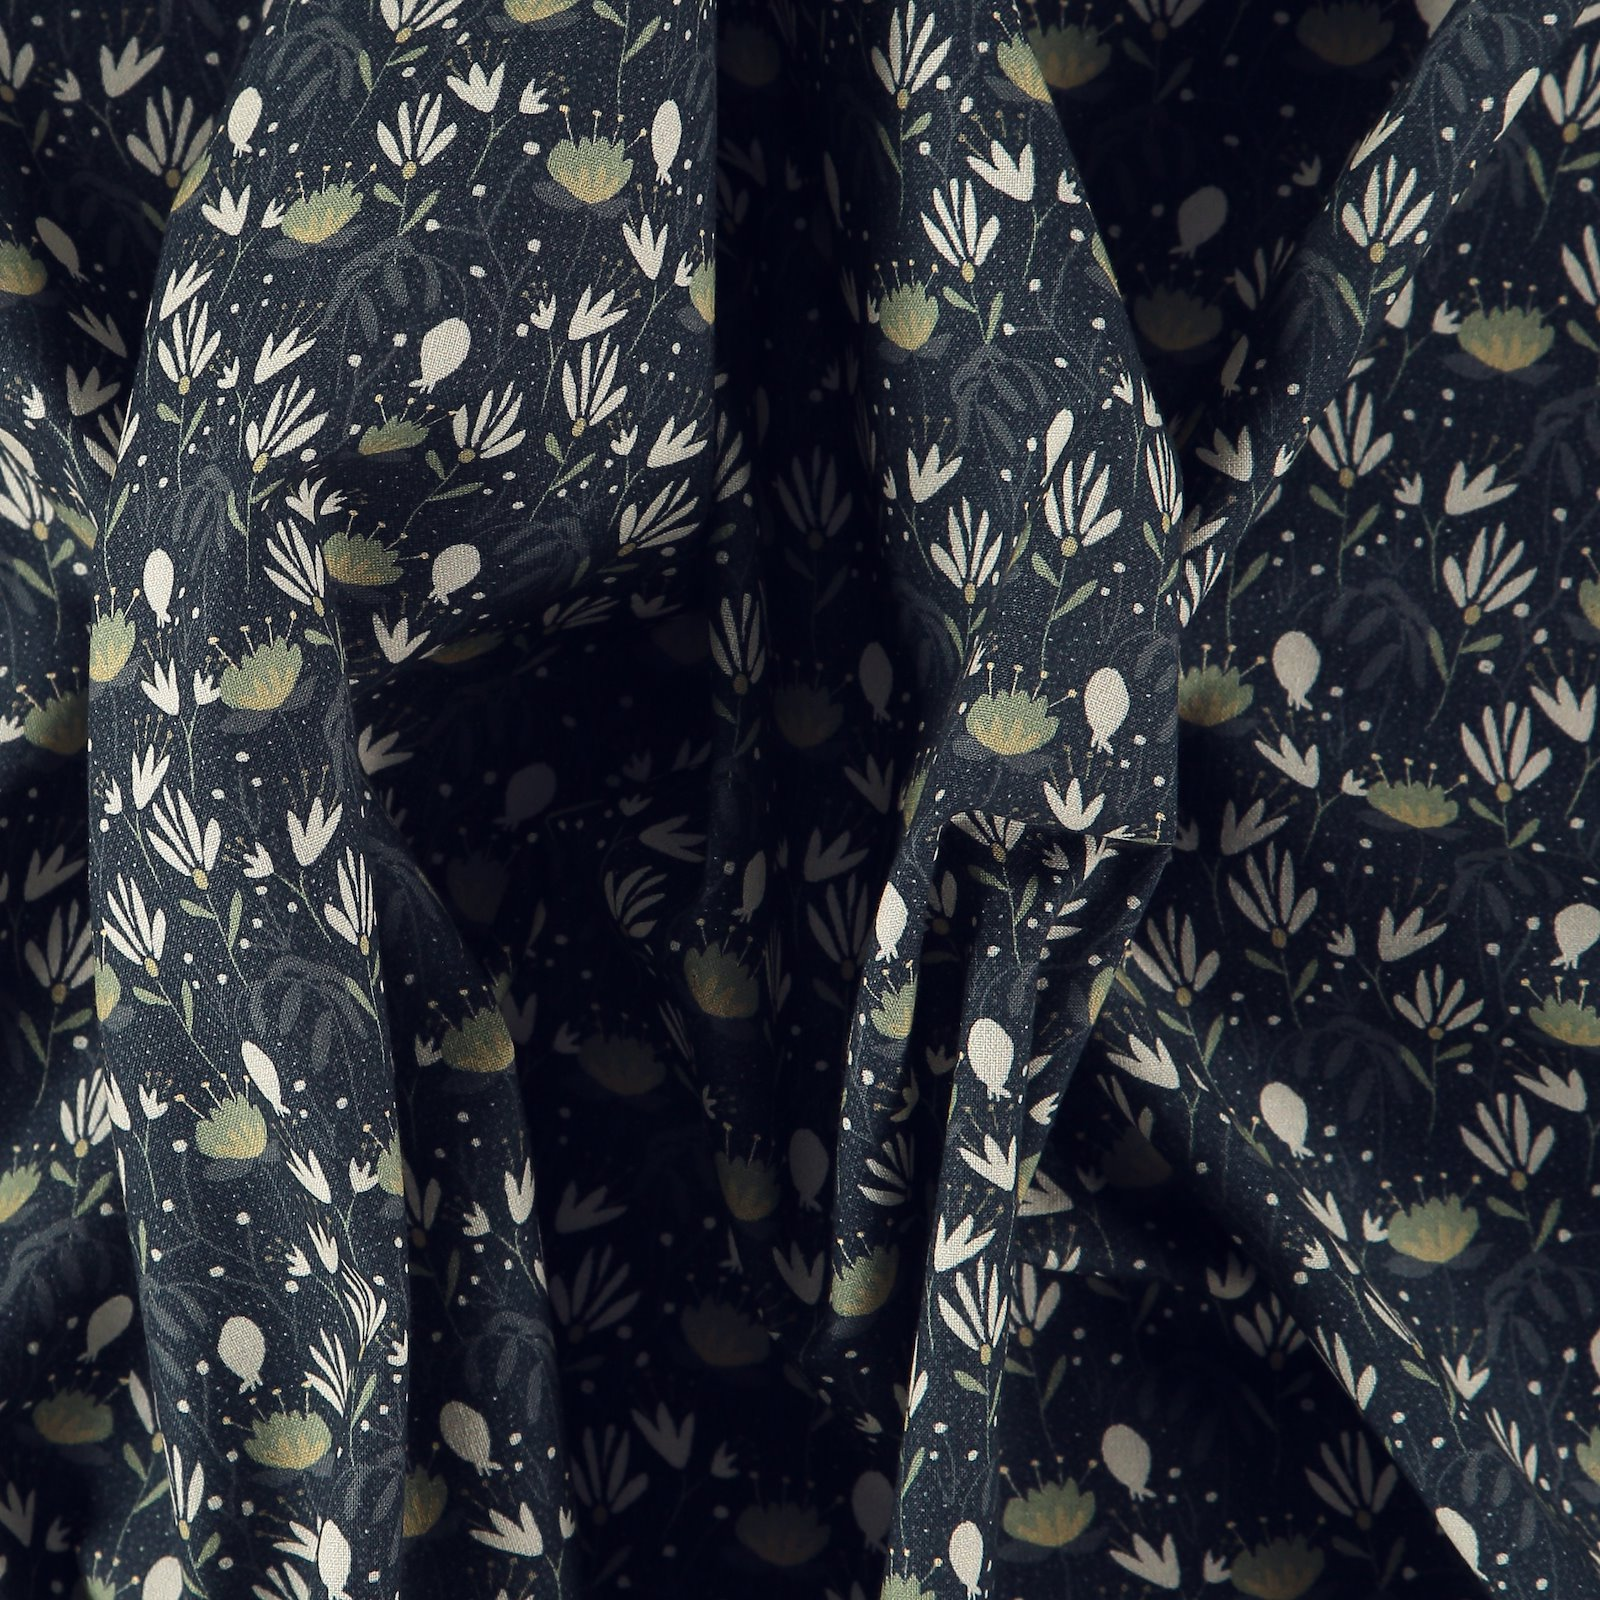 Woven cotton black w bohemian flowers 780397_pack